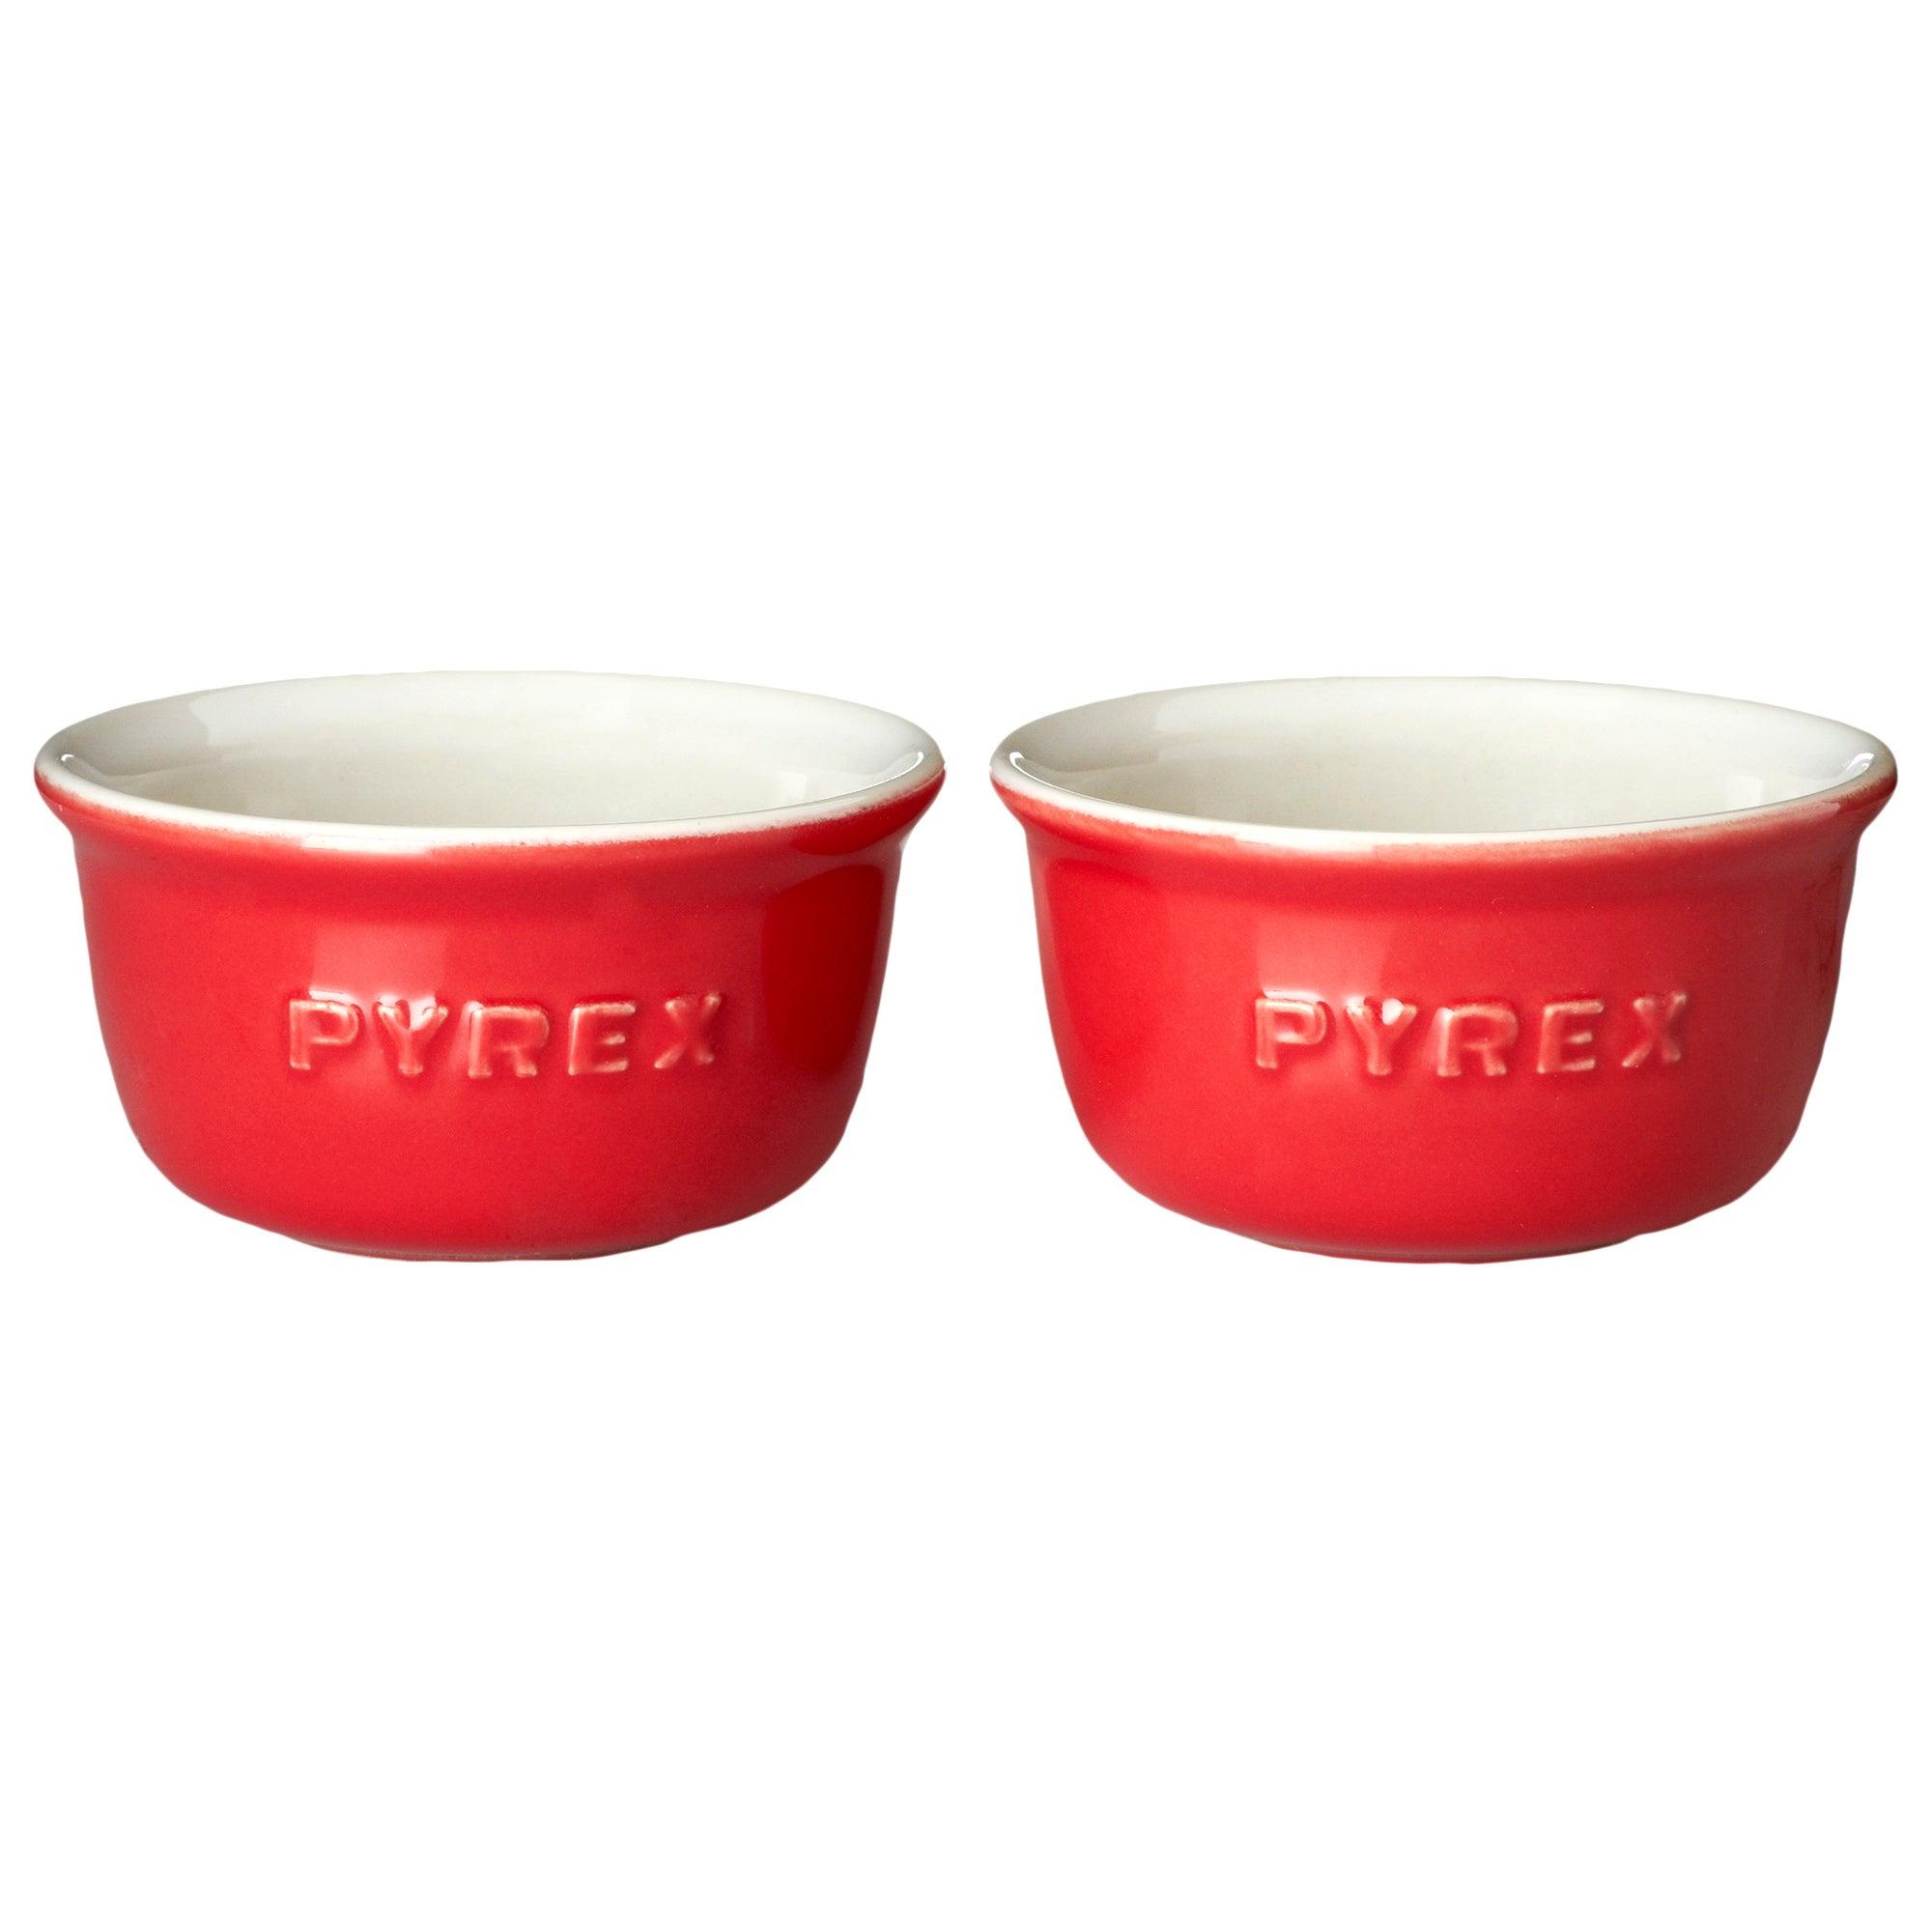 Red Pyrex Impressions Set of 2 Ramekins